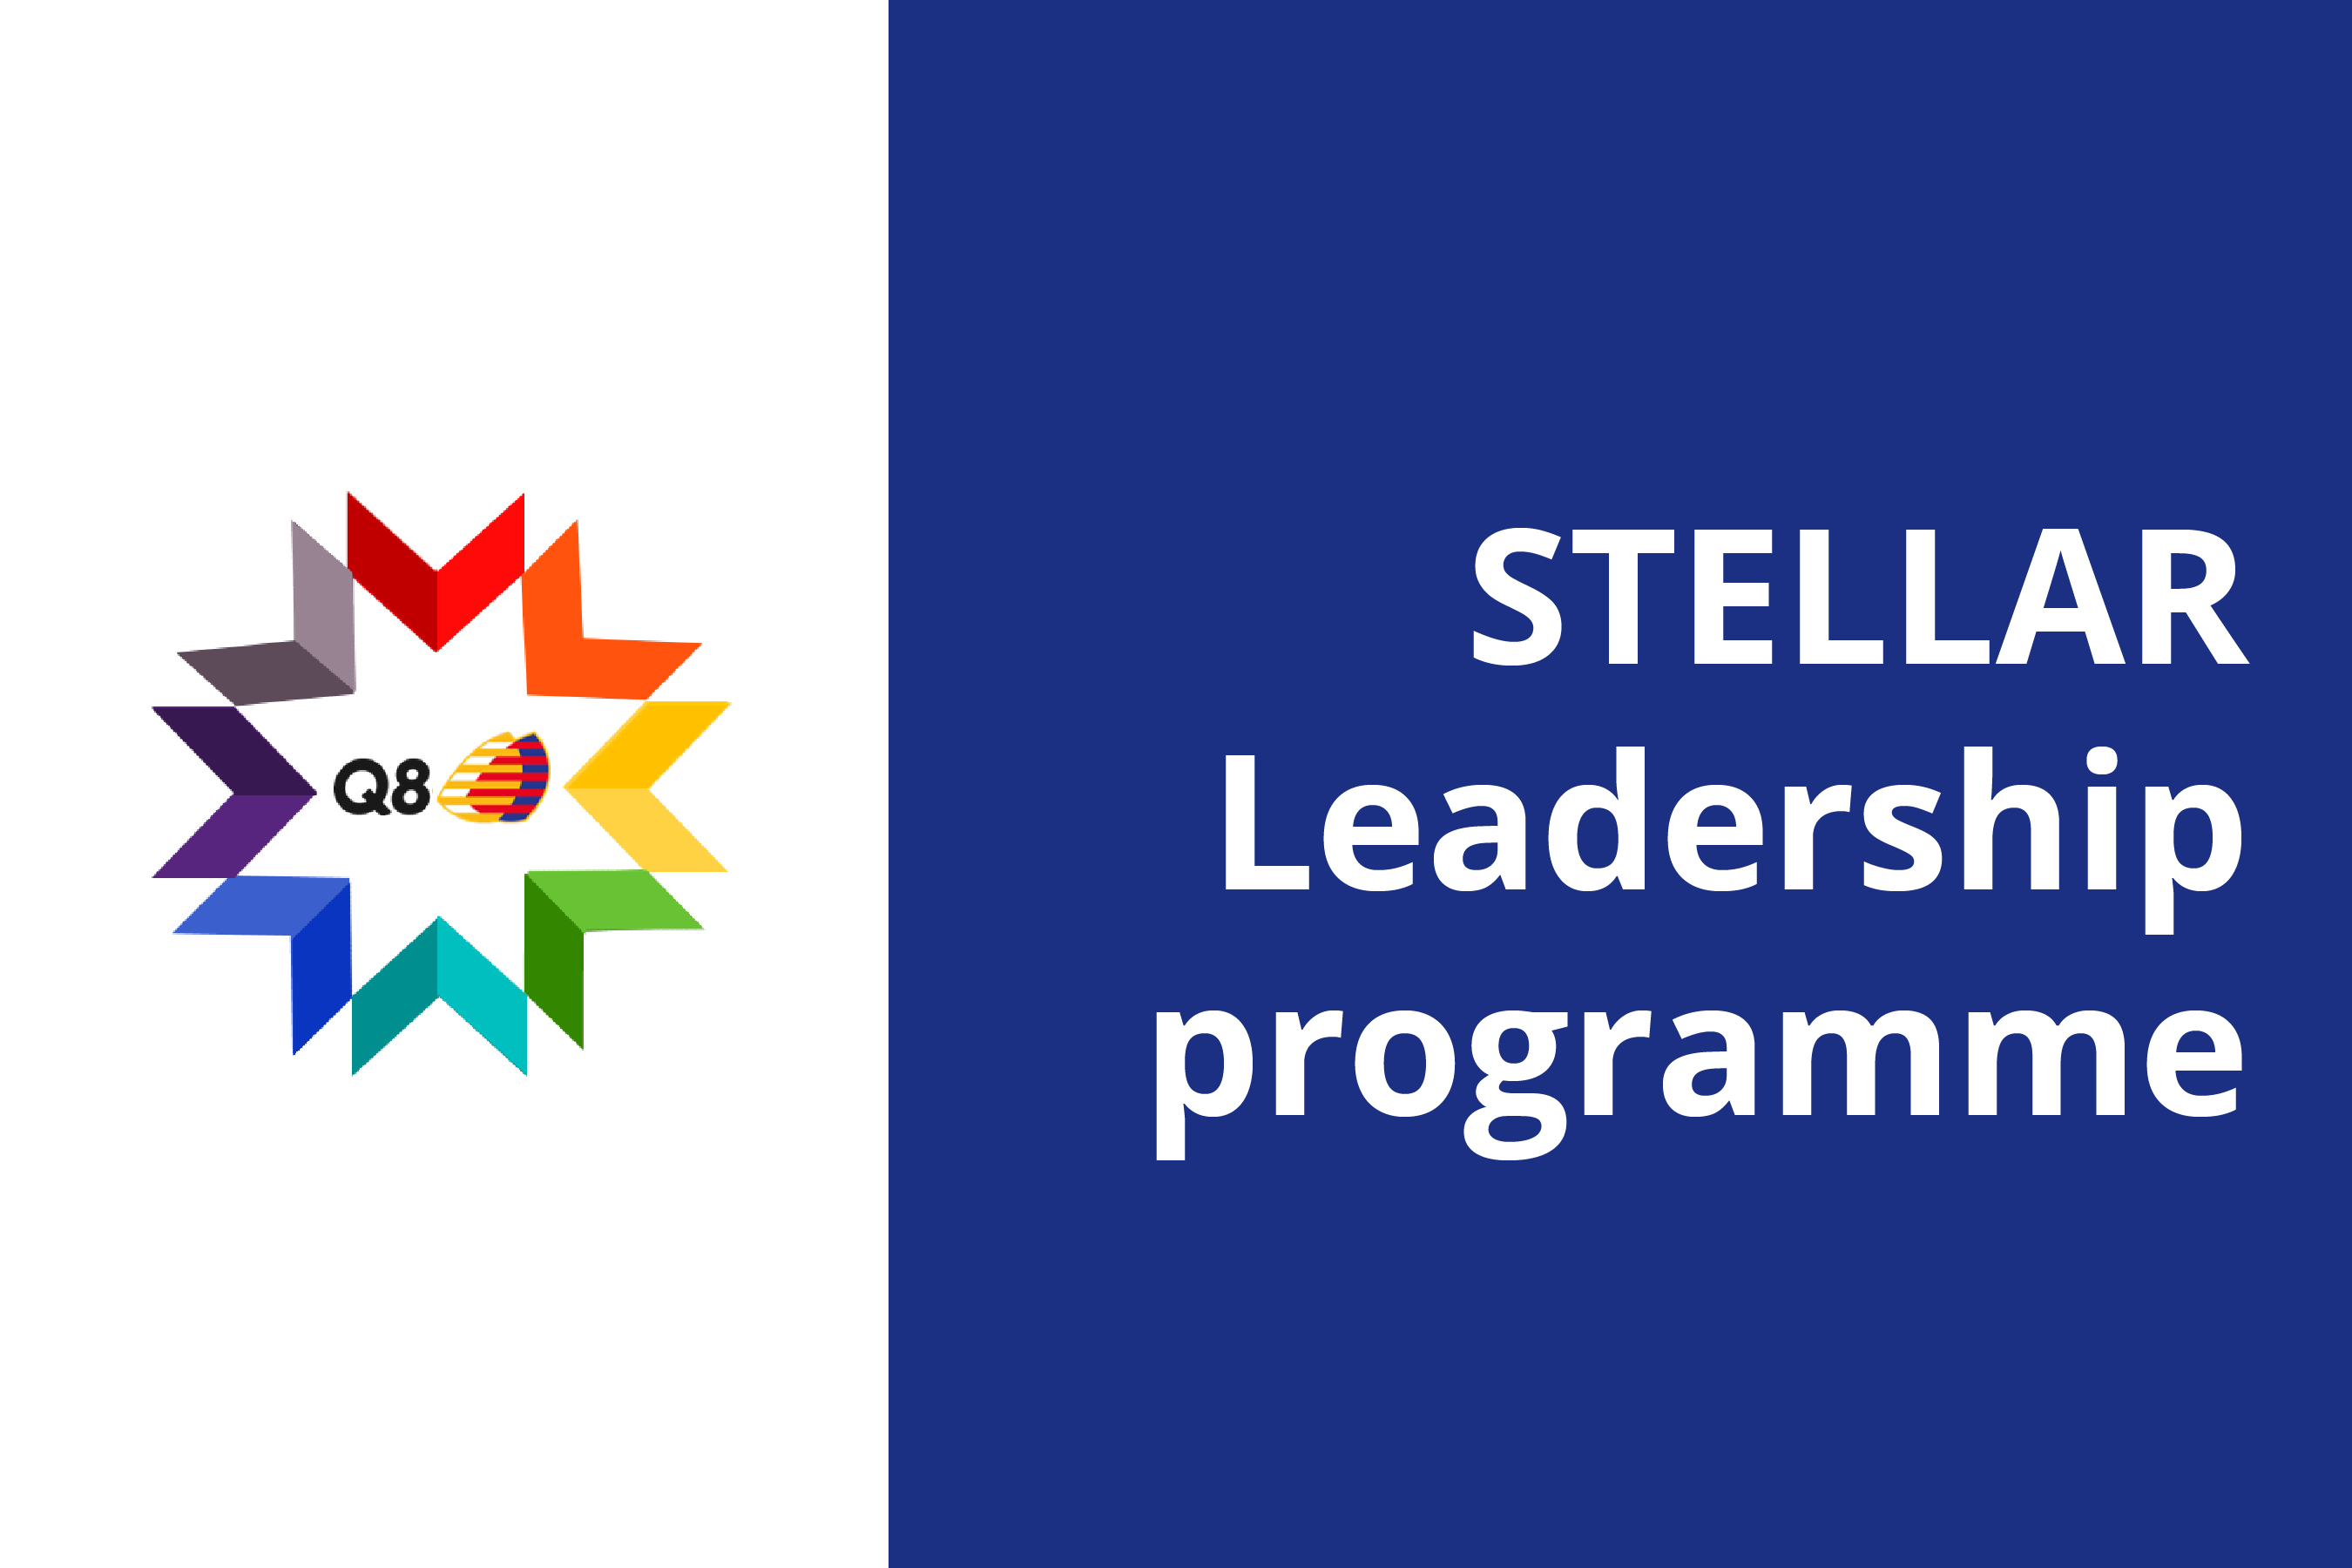 STELLAR Leadership Development Programme